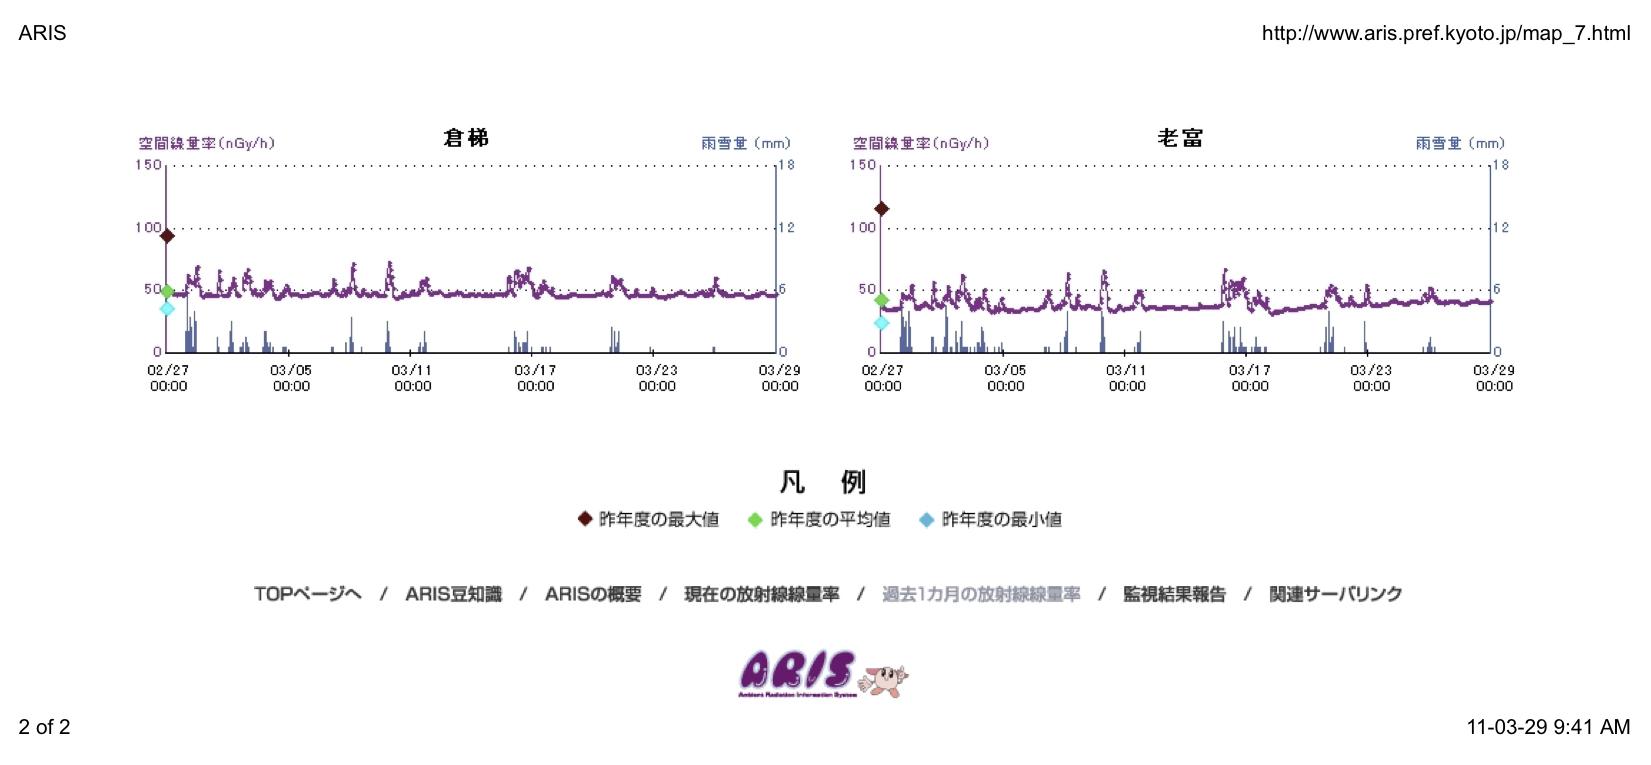 Kyoto radiation graphs 2.jpg